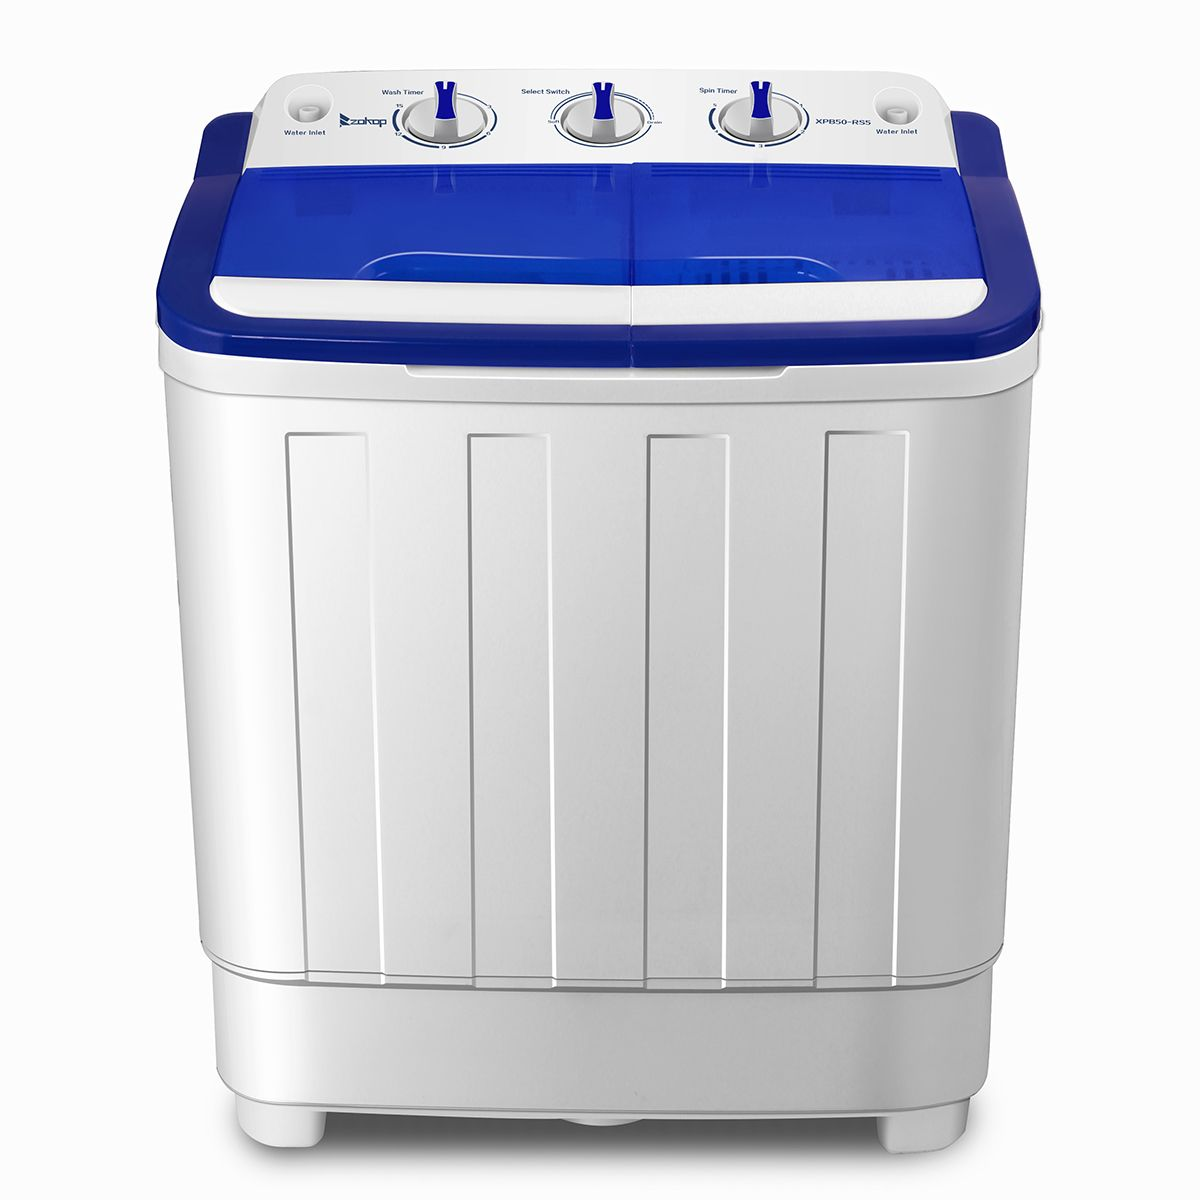 Home Compact Washing Machine Twin Tub Portable Washing Machine